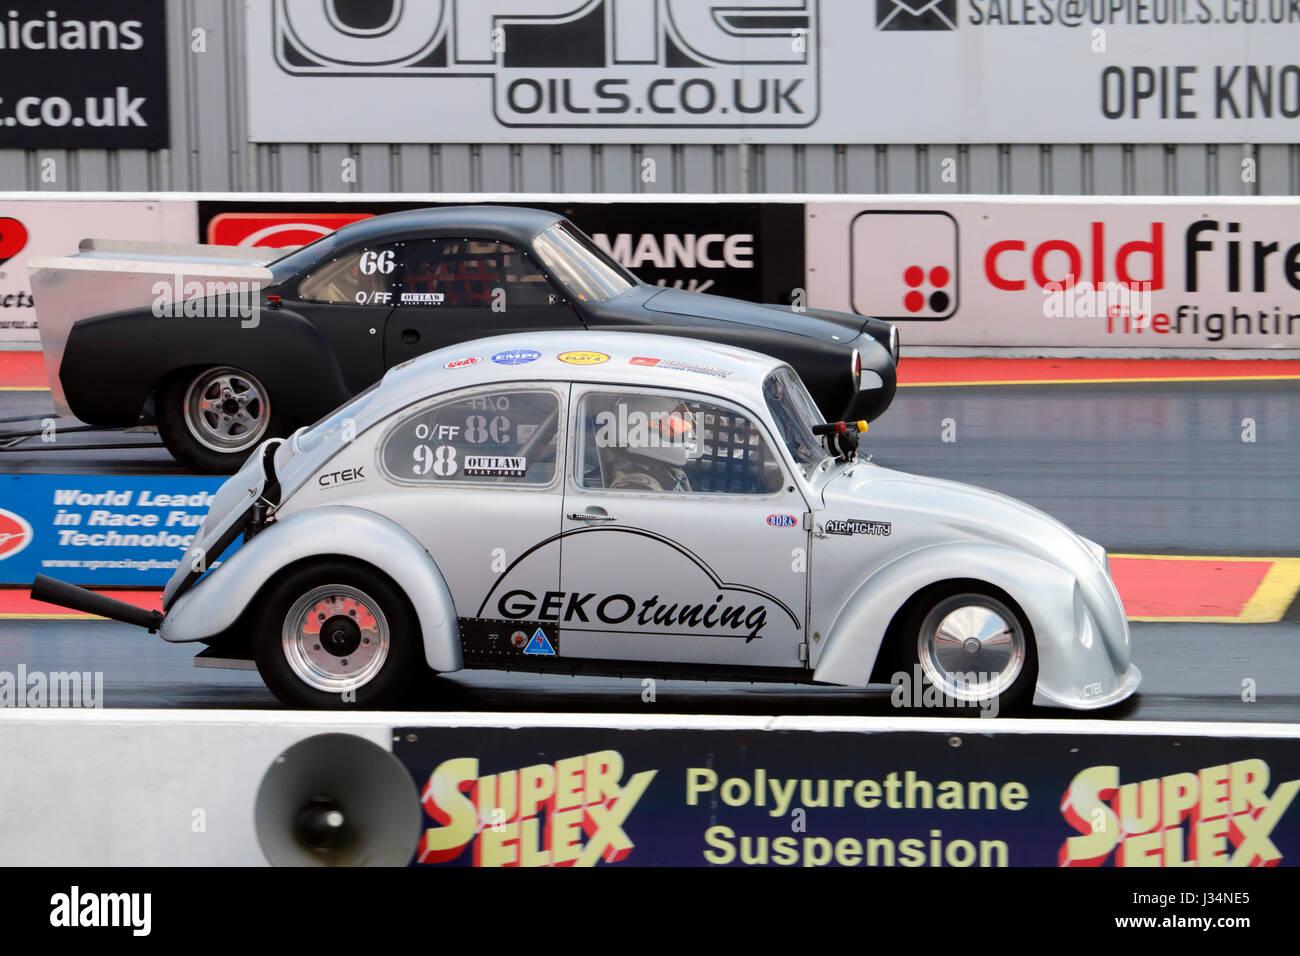 Zwei VW Hot Rods auf dem Santa Pod raceway Stockbild